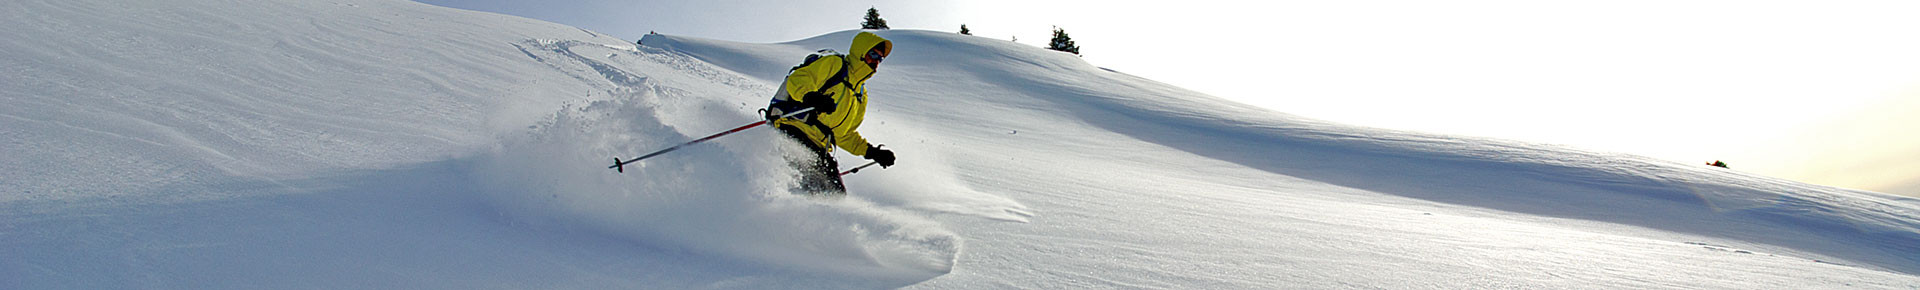 Ski hors piste en Vallée d'Aulps